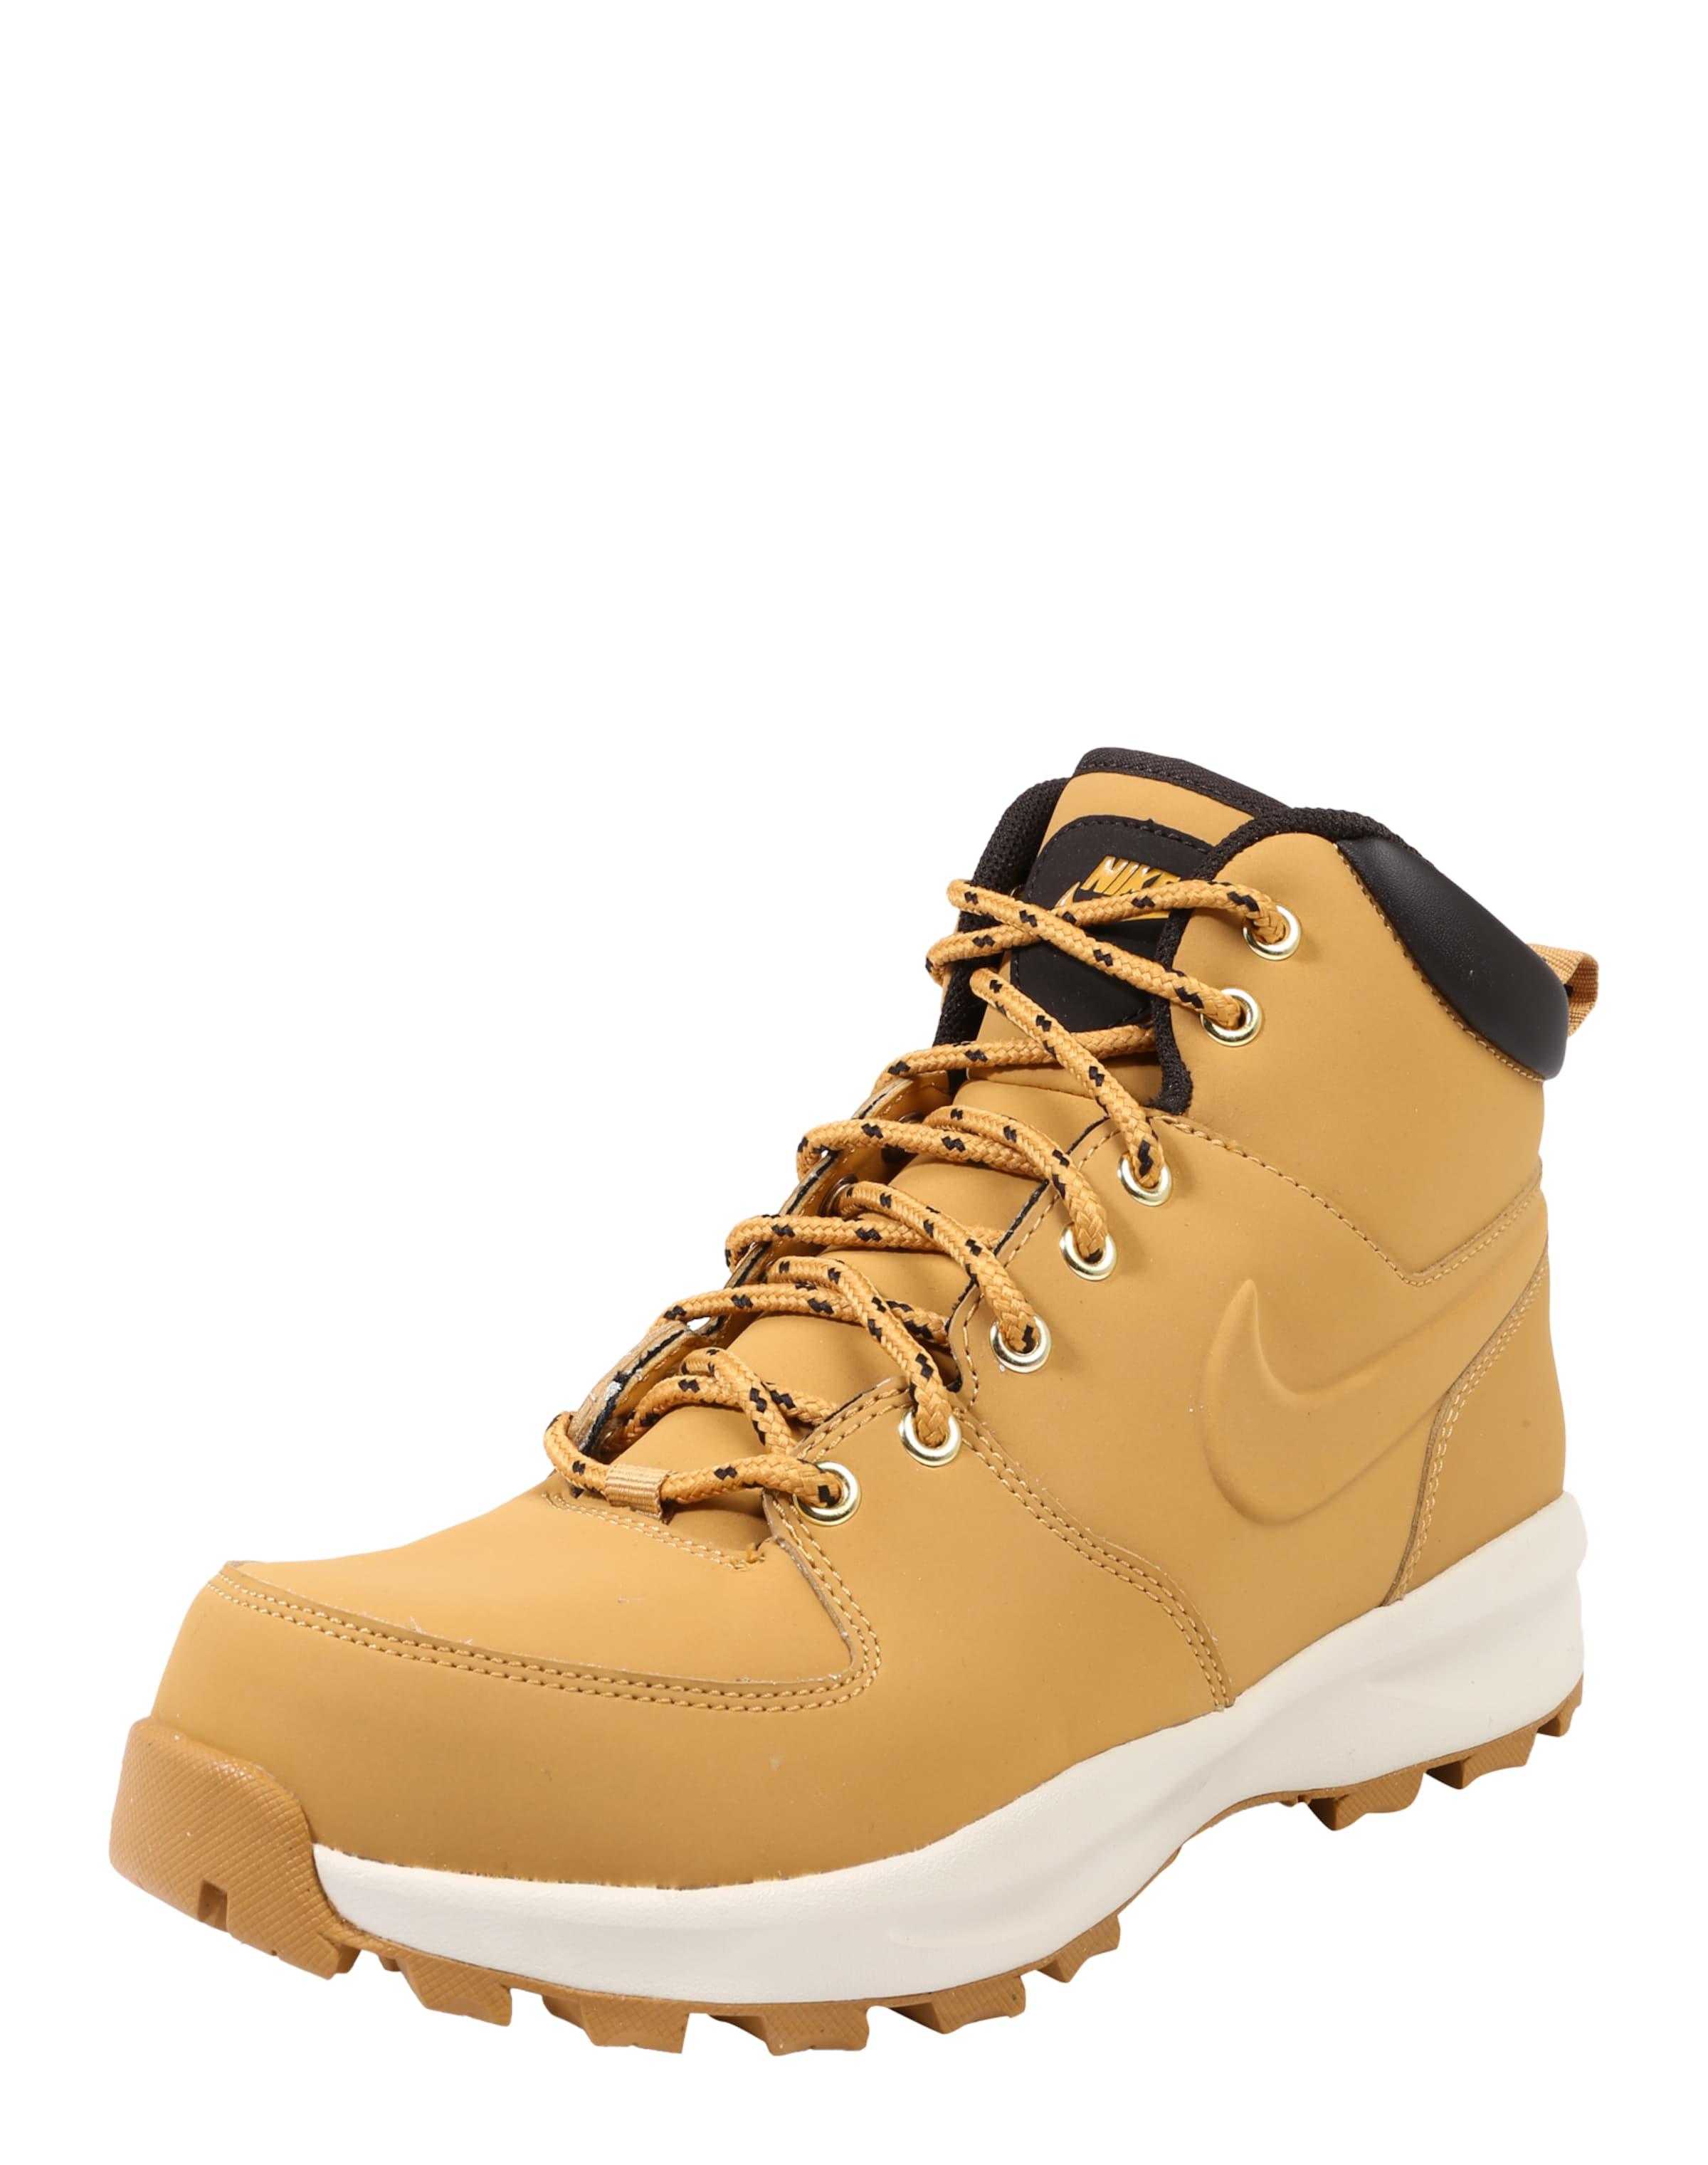 'manoa' Sand Sportswear Nike In High Sneaker CedxoB